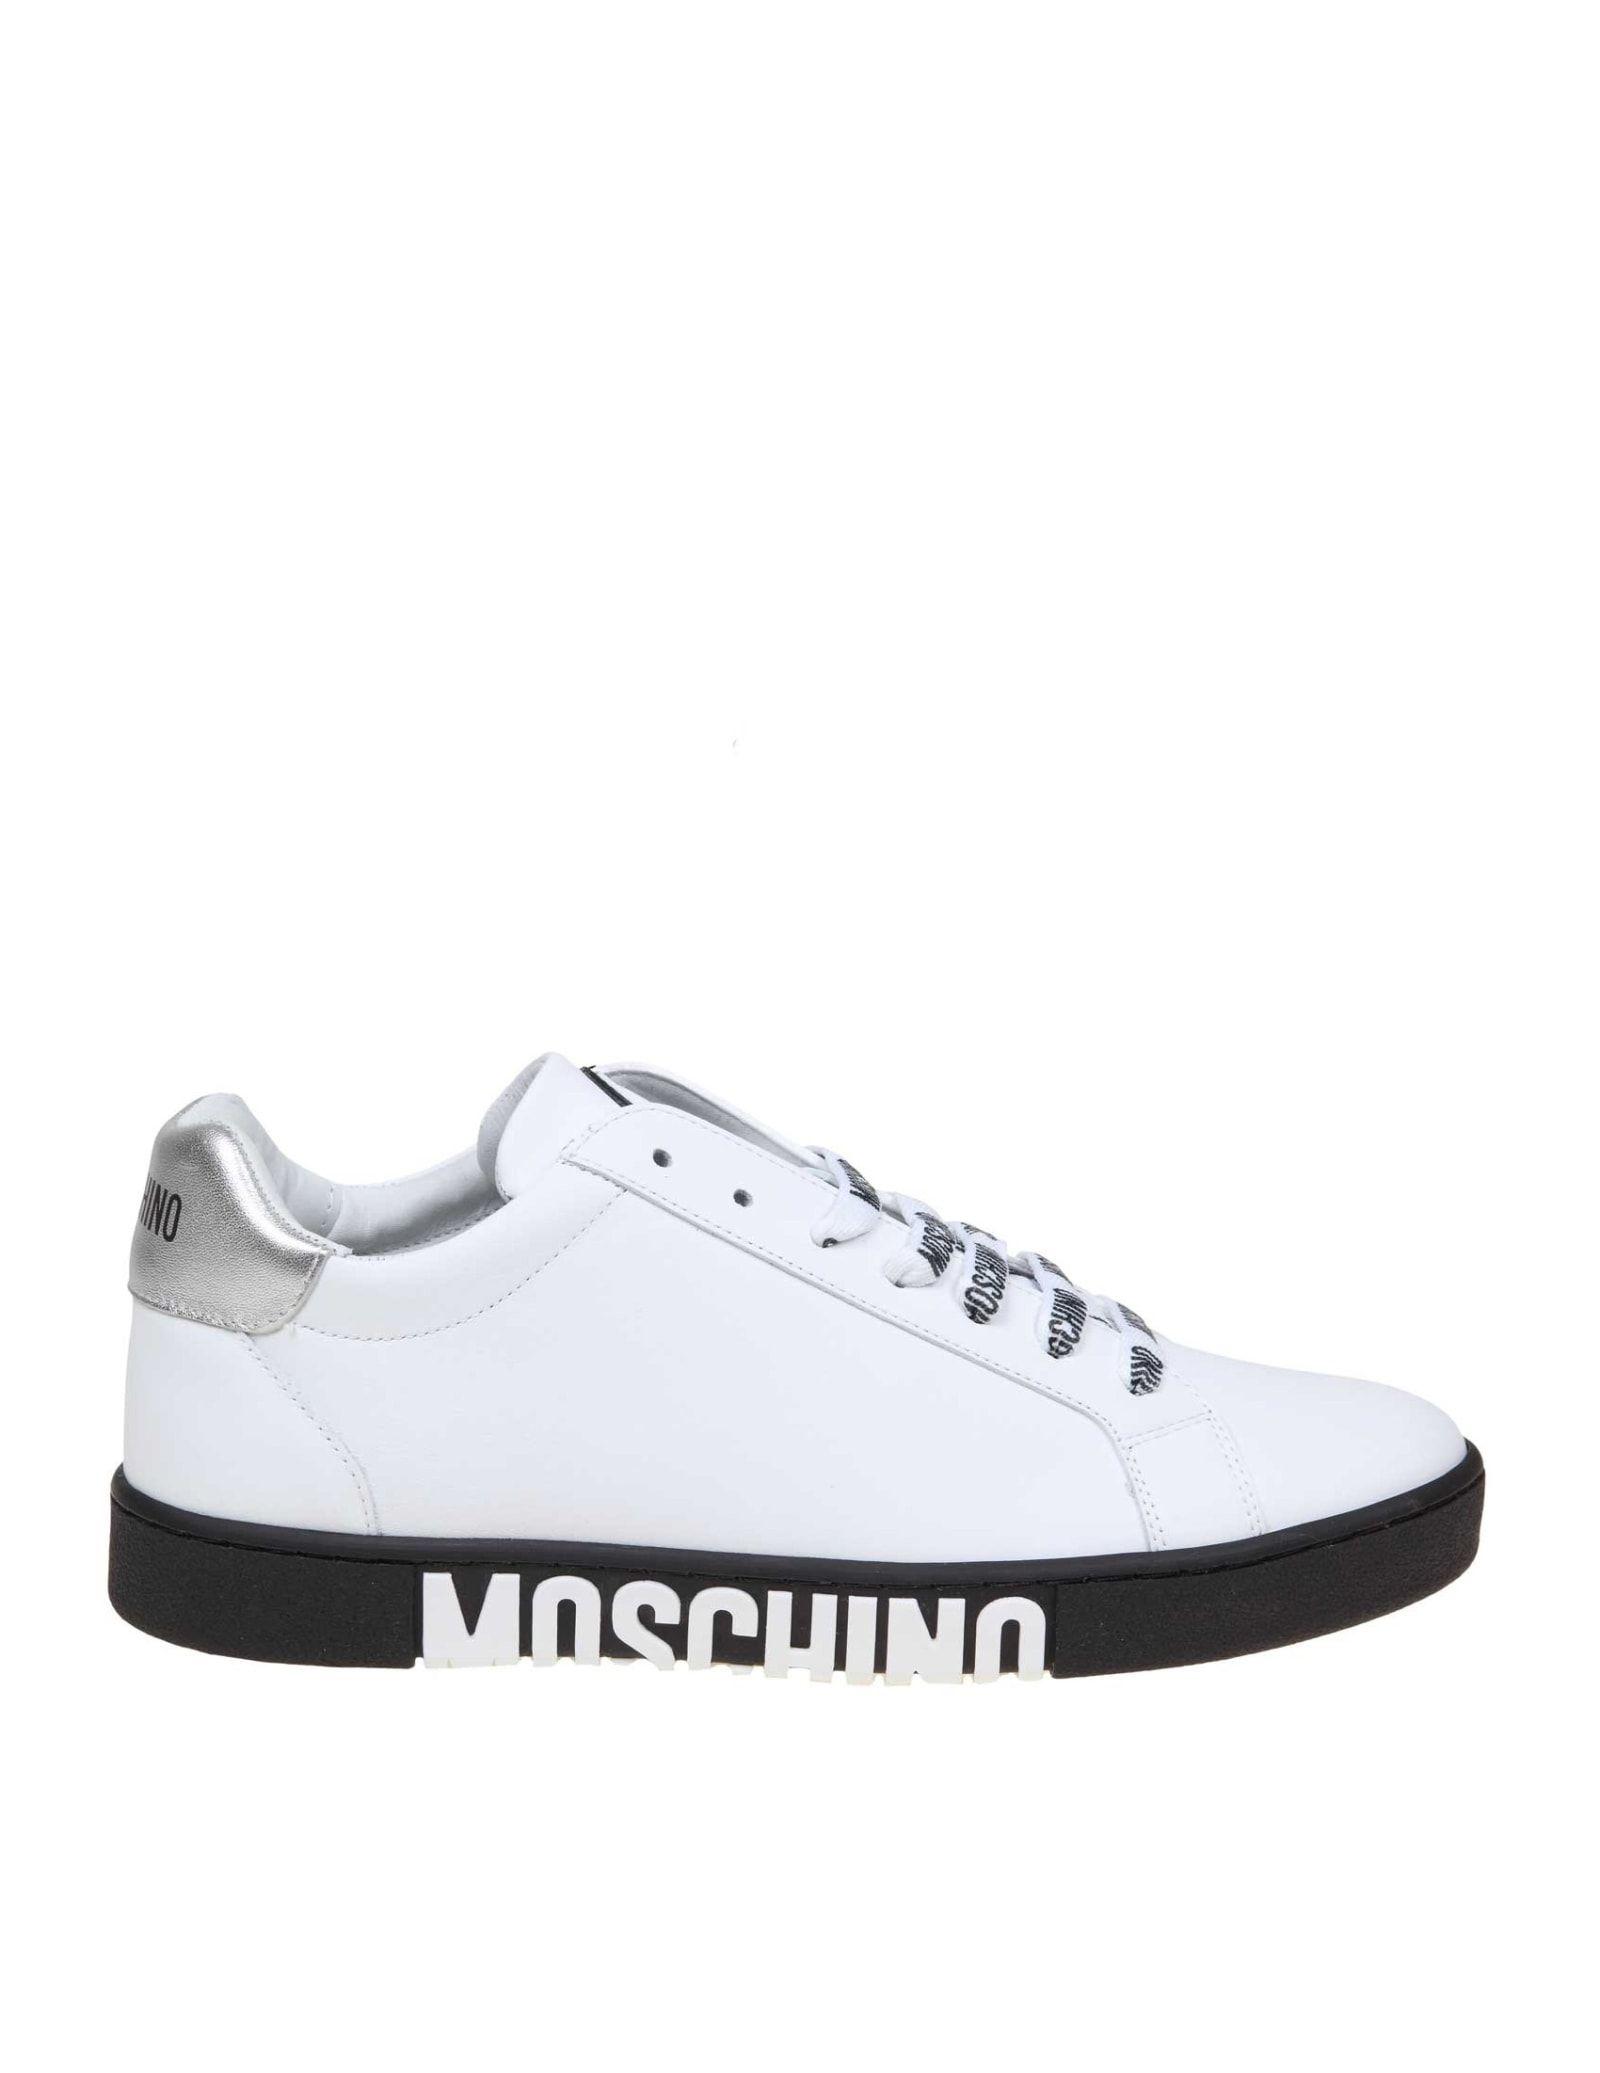 Moschino Moschino Sneakers In White